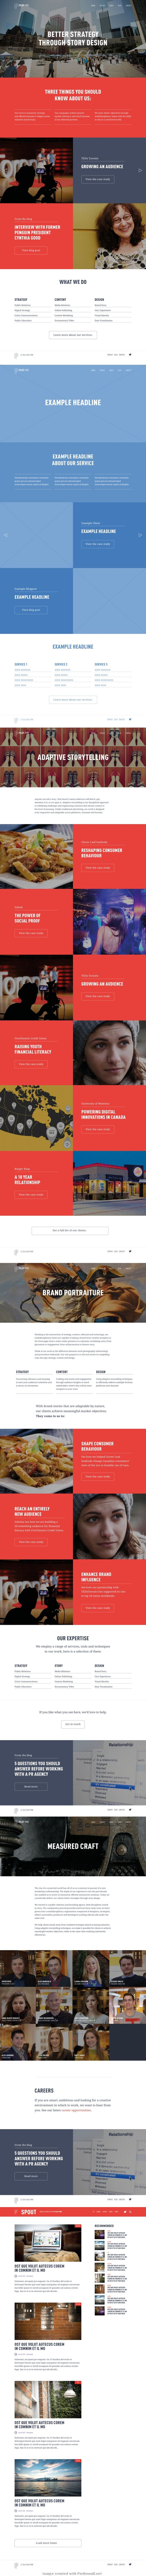 Simple Farben + Typografie